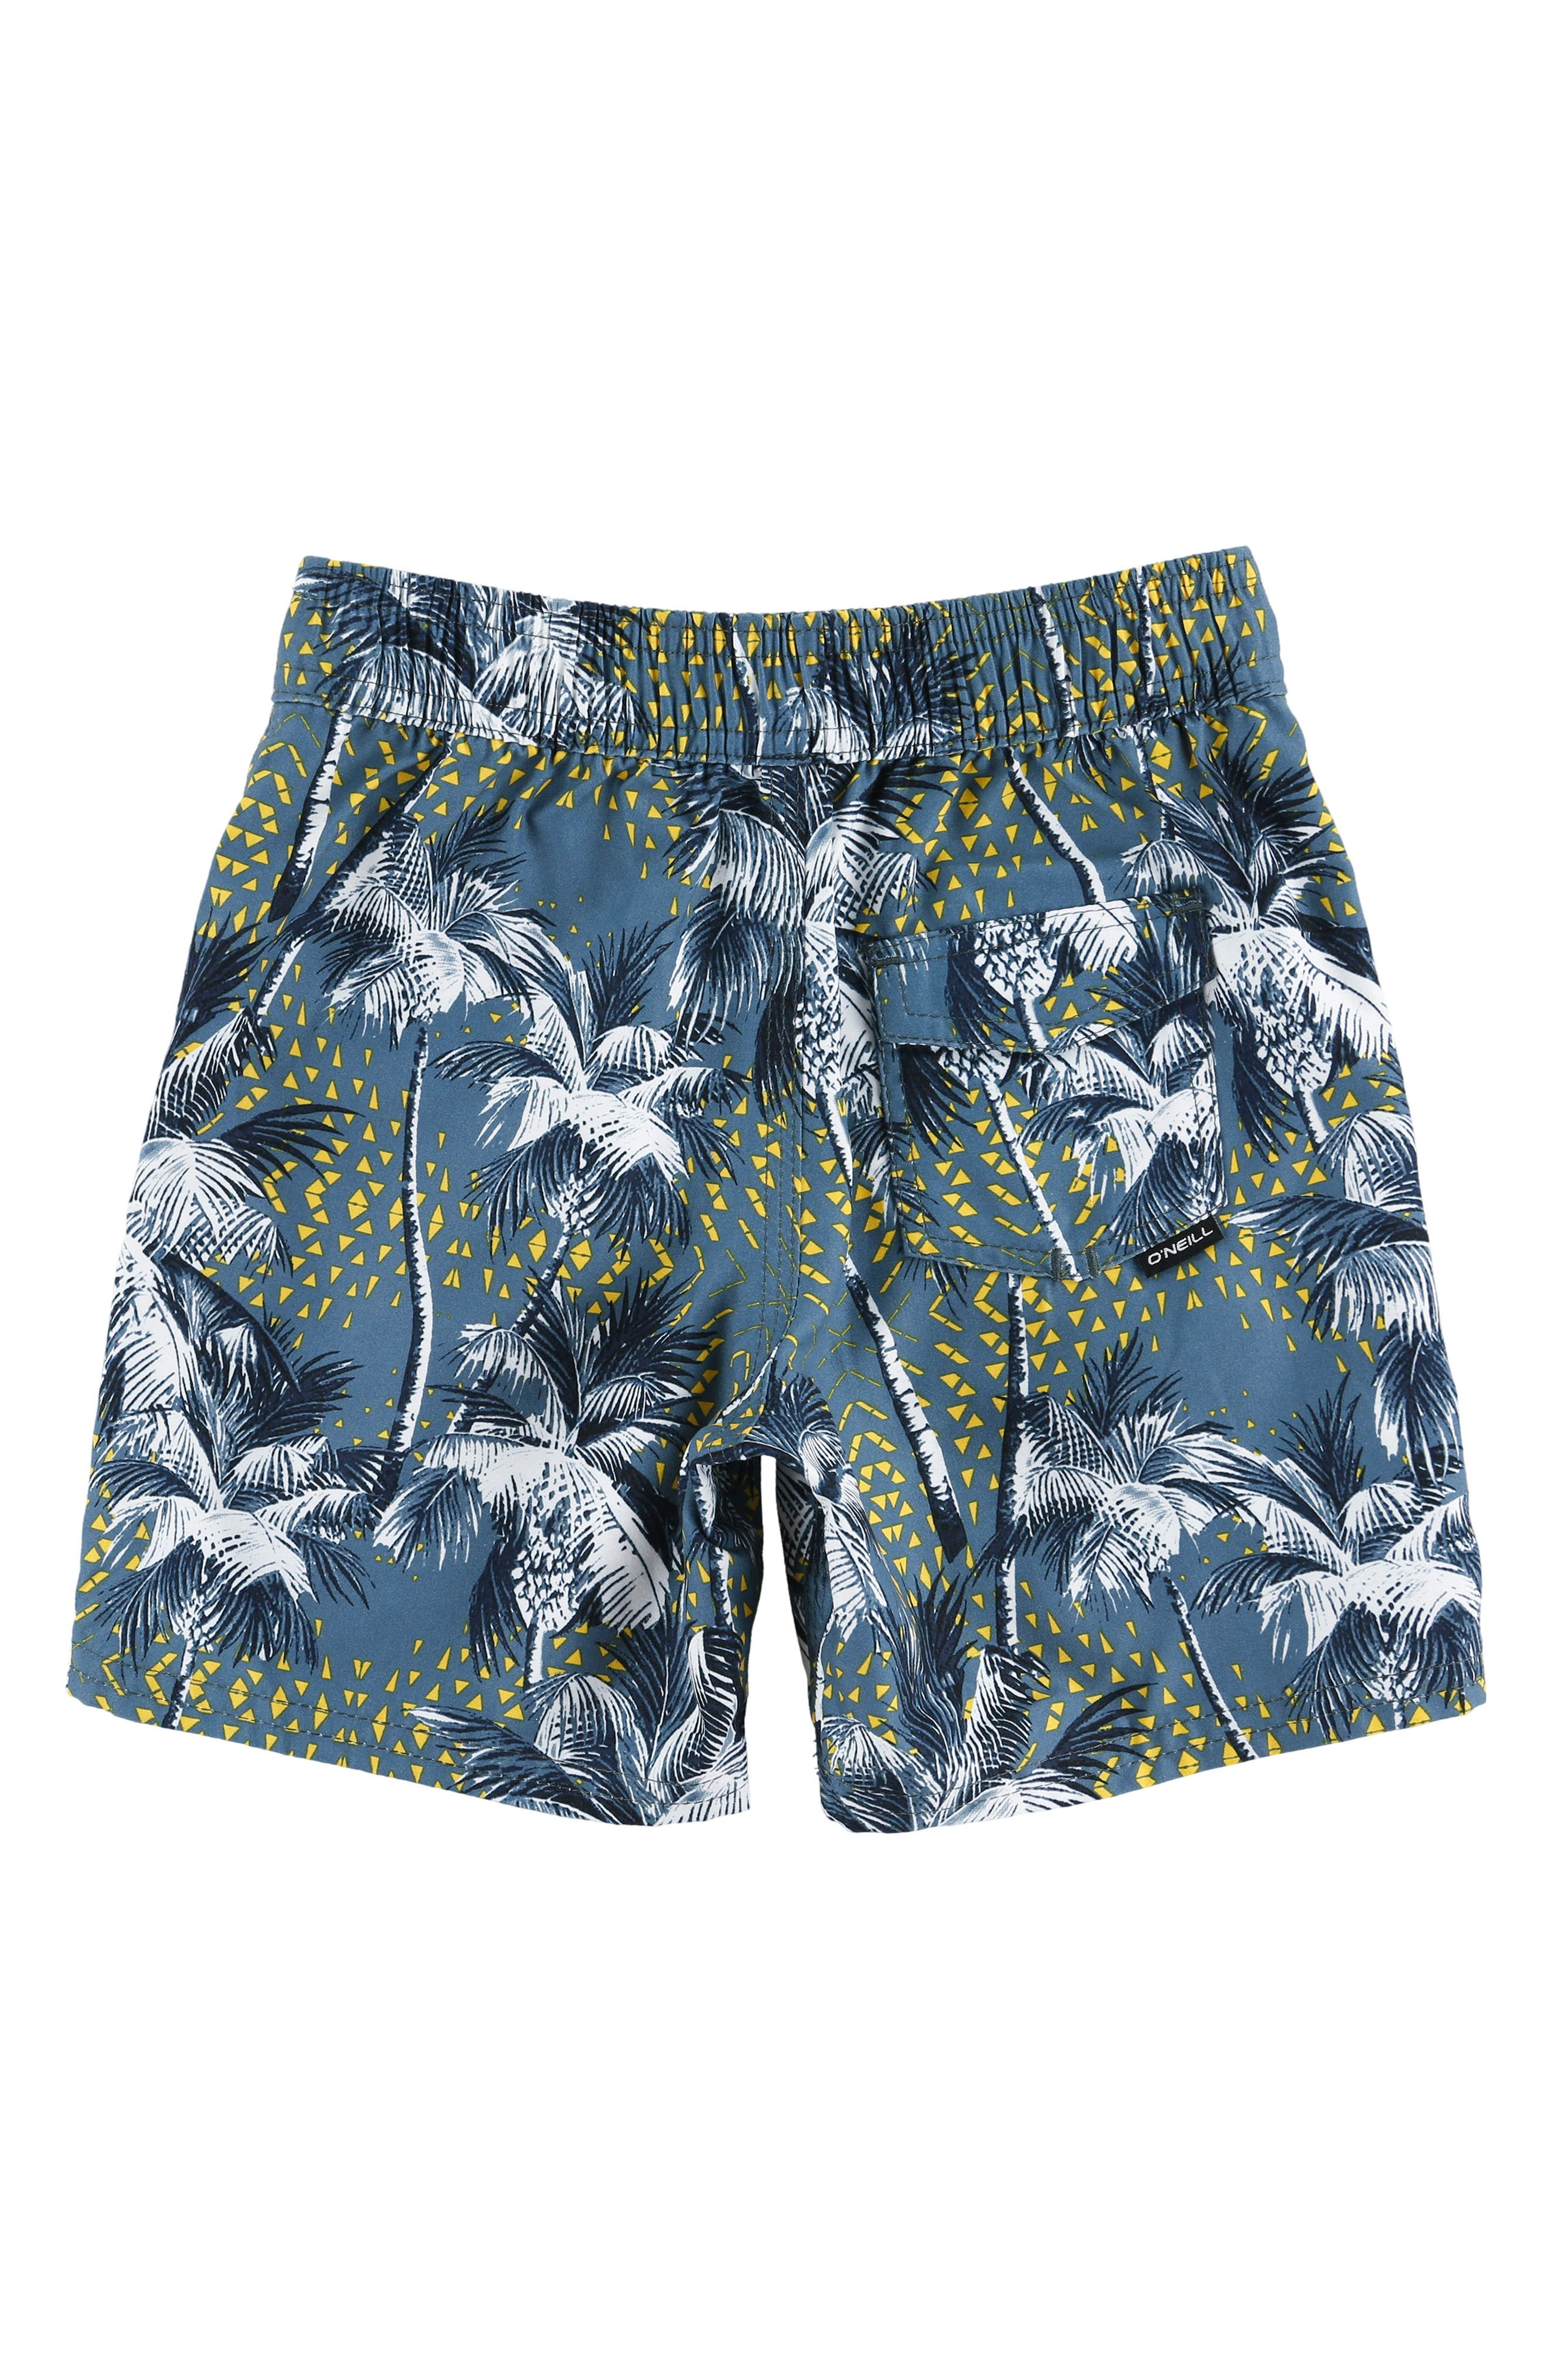 Darn Old Palmer Board Shorts,                             Alternate thumbnail 2, color,                             DUST BLUE